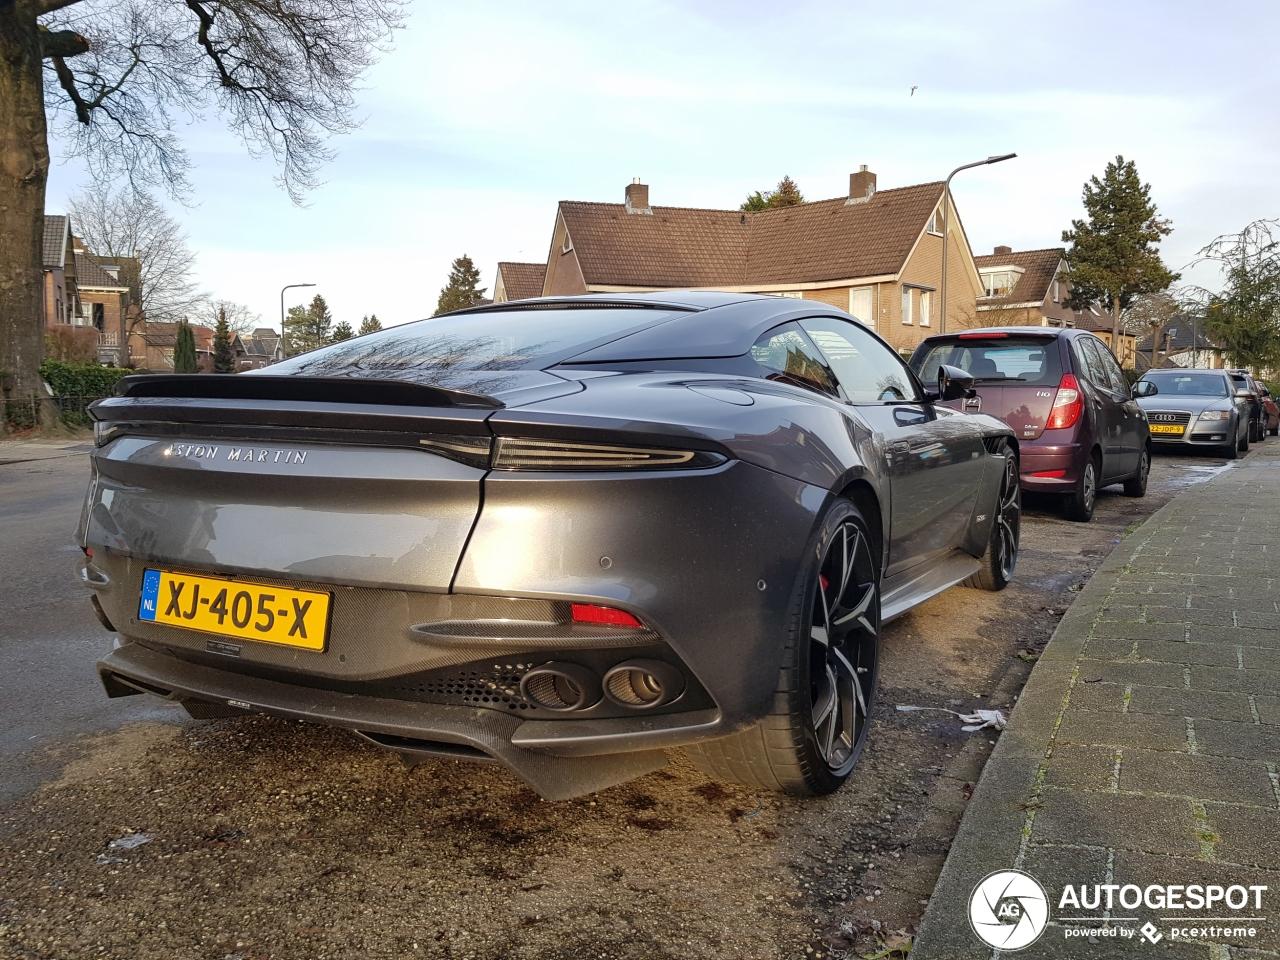 Eerste Nederlandse Aston Martin DBS Superleggera gespot